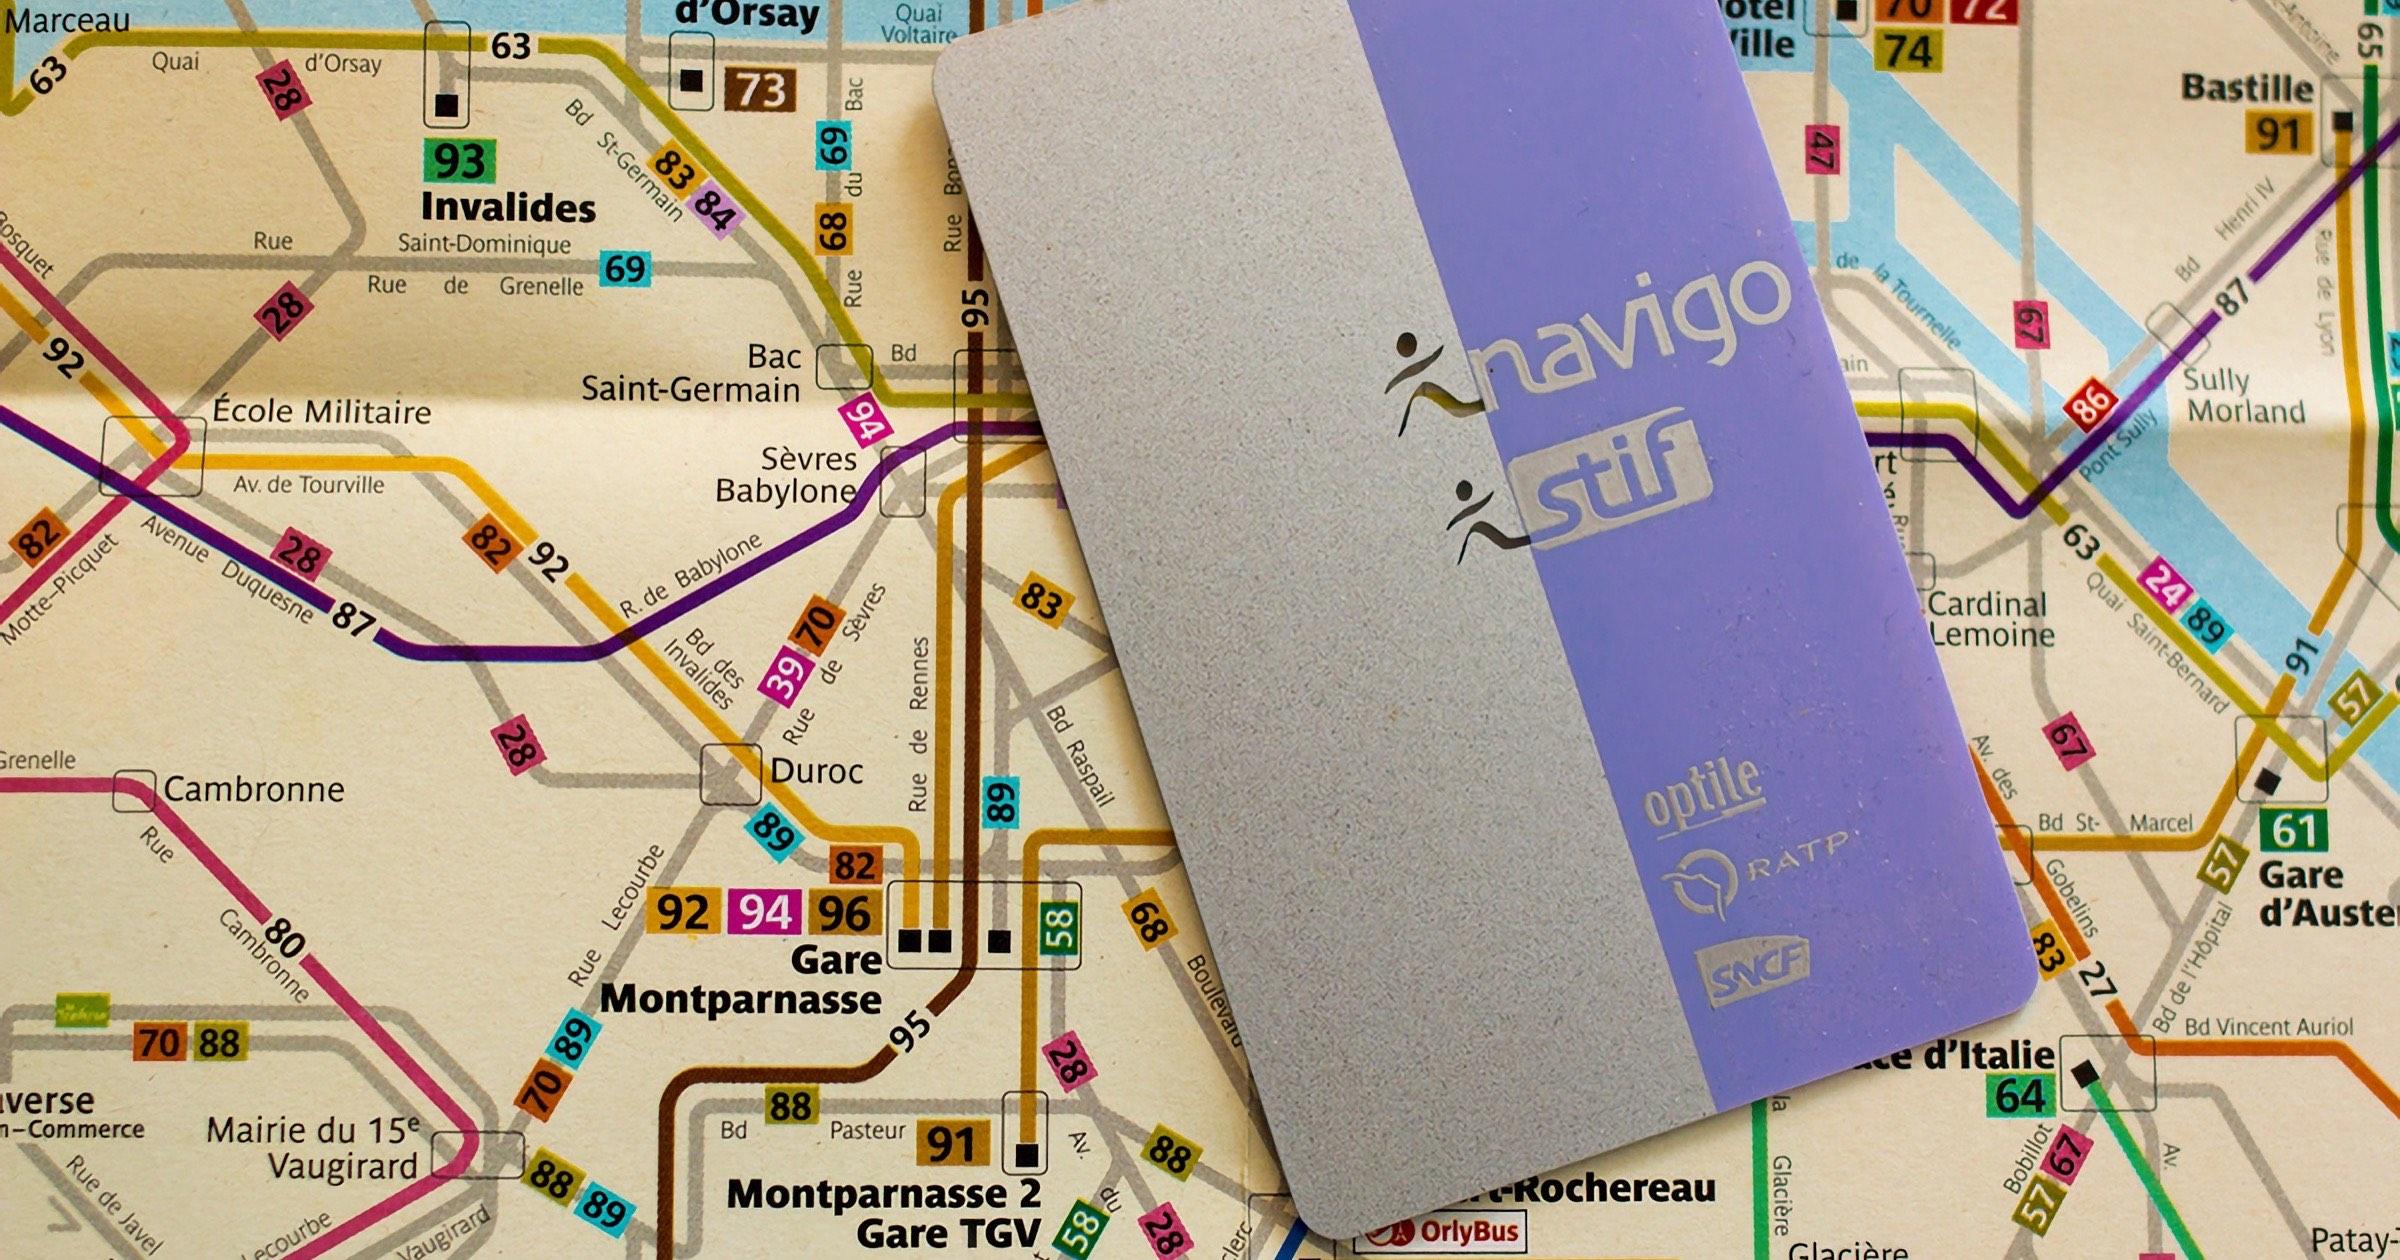 Navigo pass